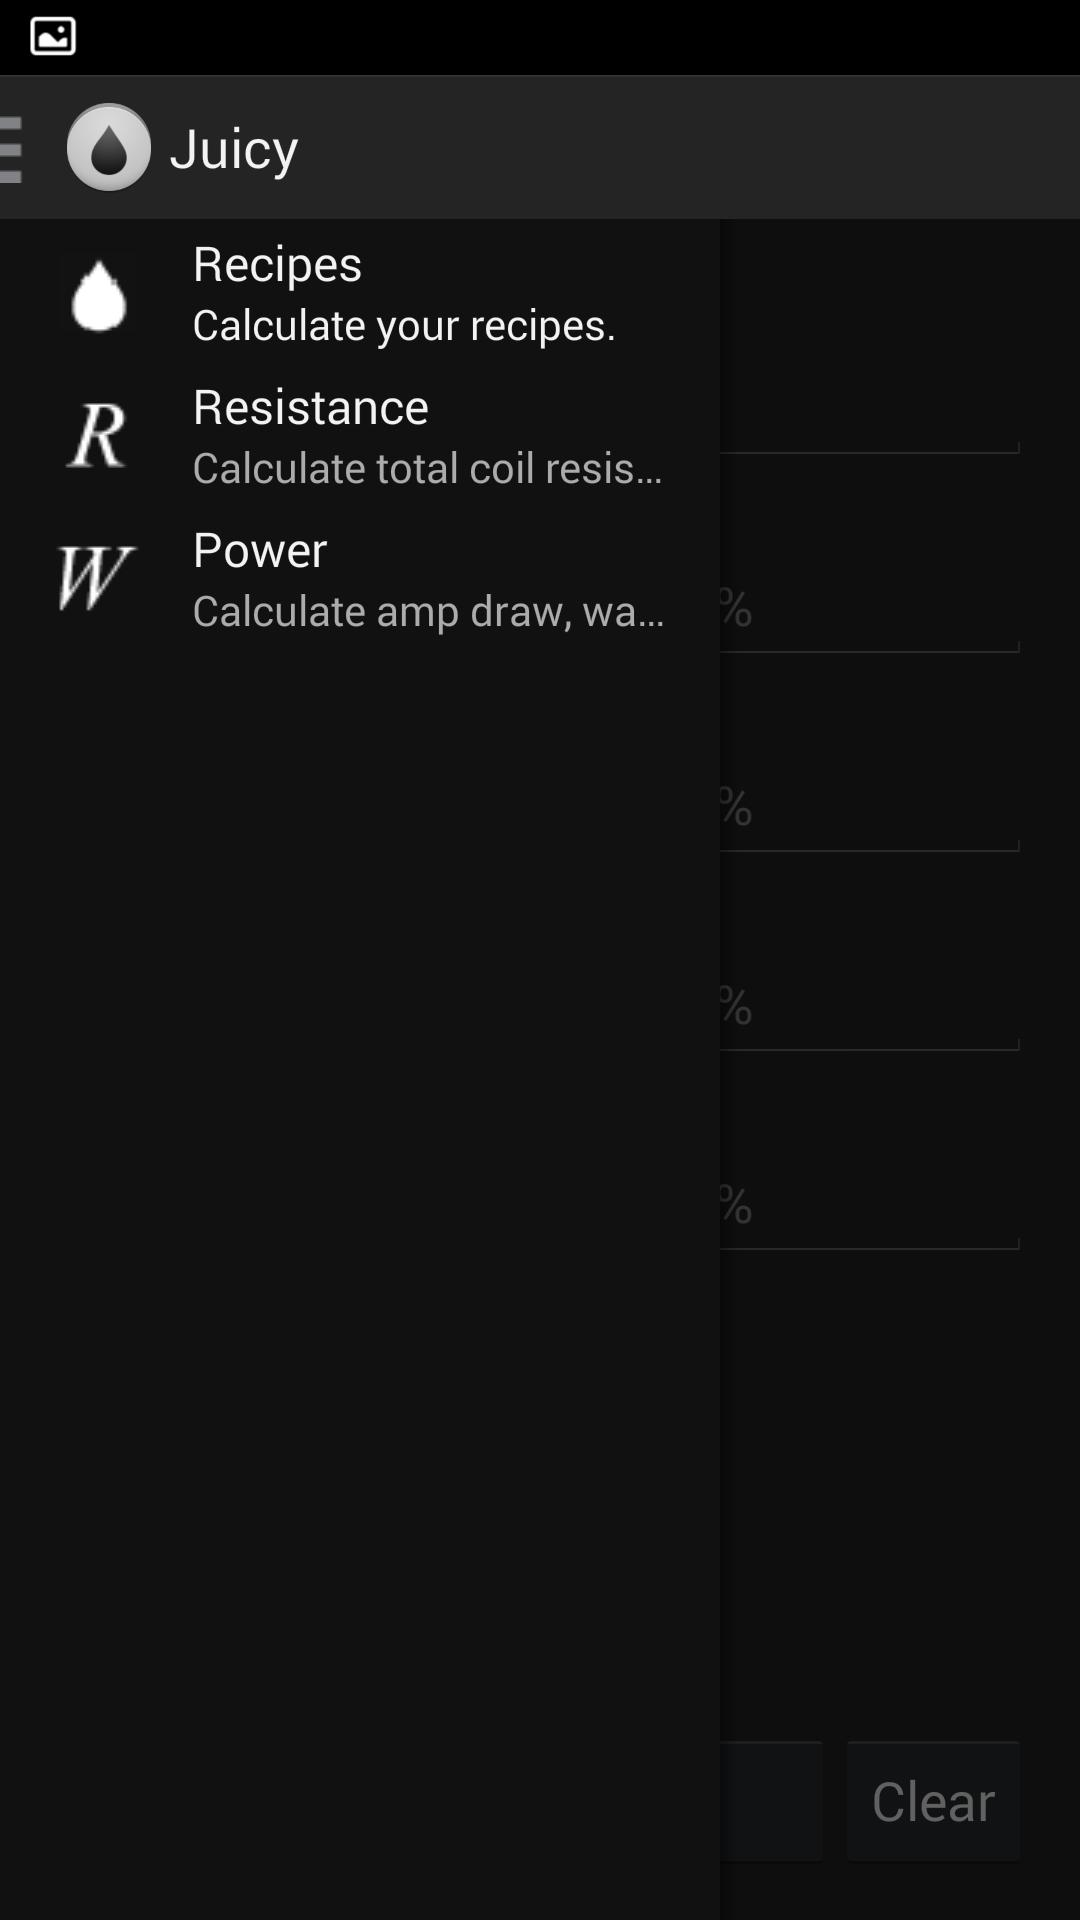 screenshot_2014-01-14-19-39-03